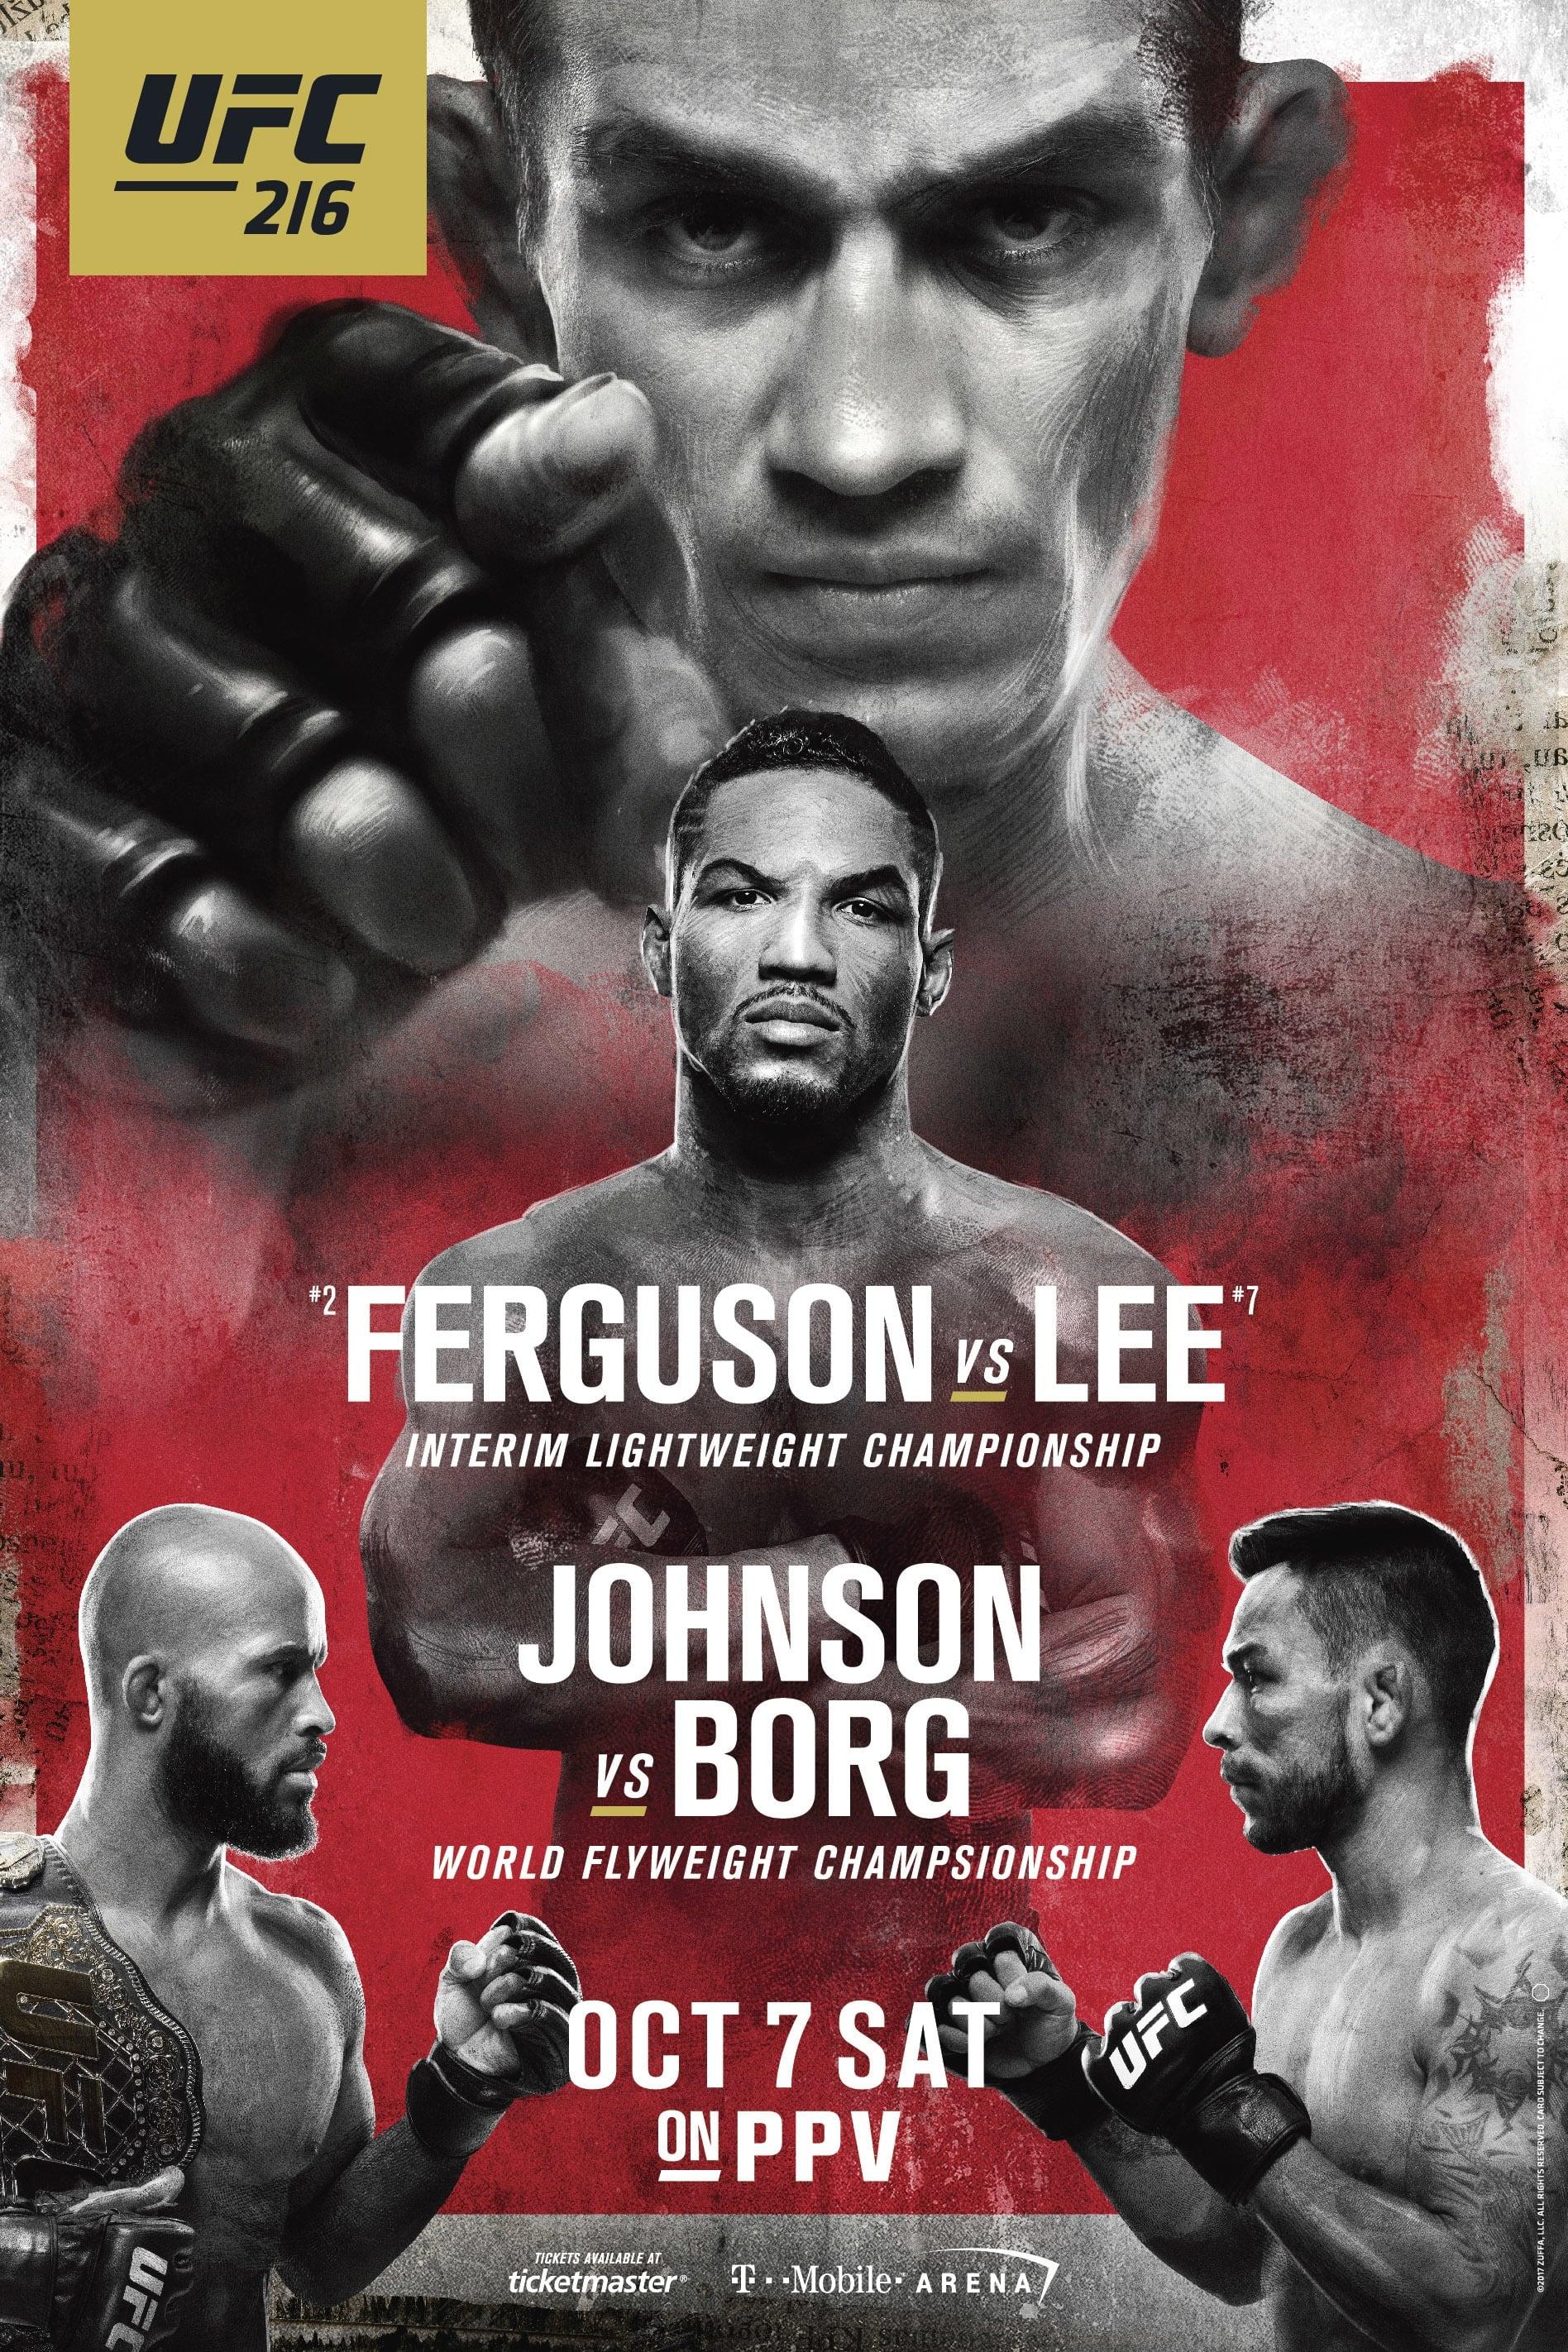 UFC 216: Ferguson vs. Lee